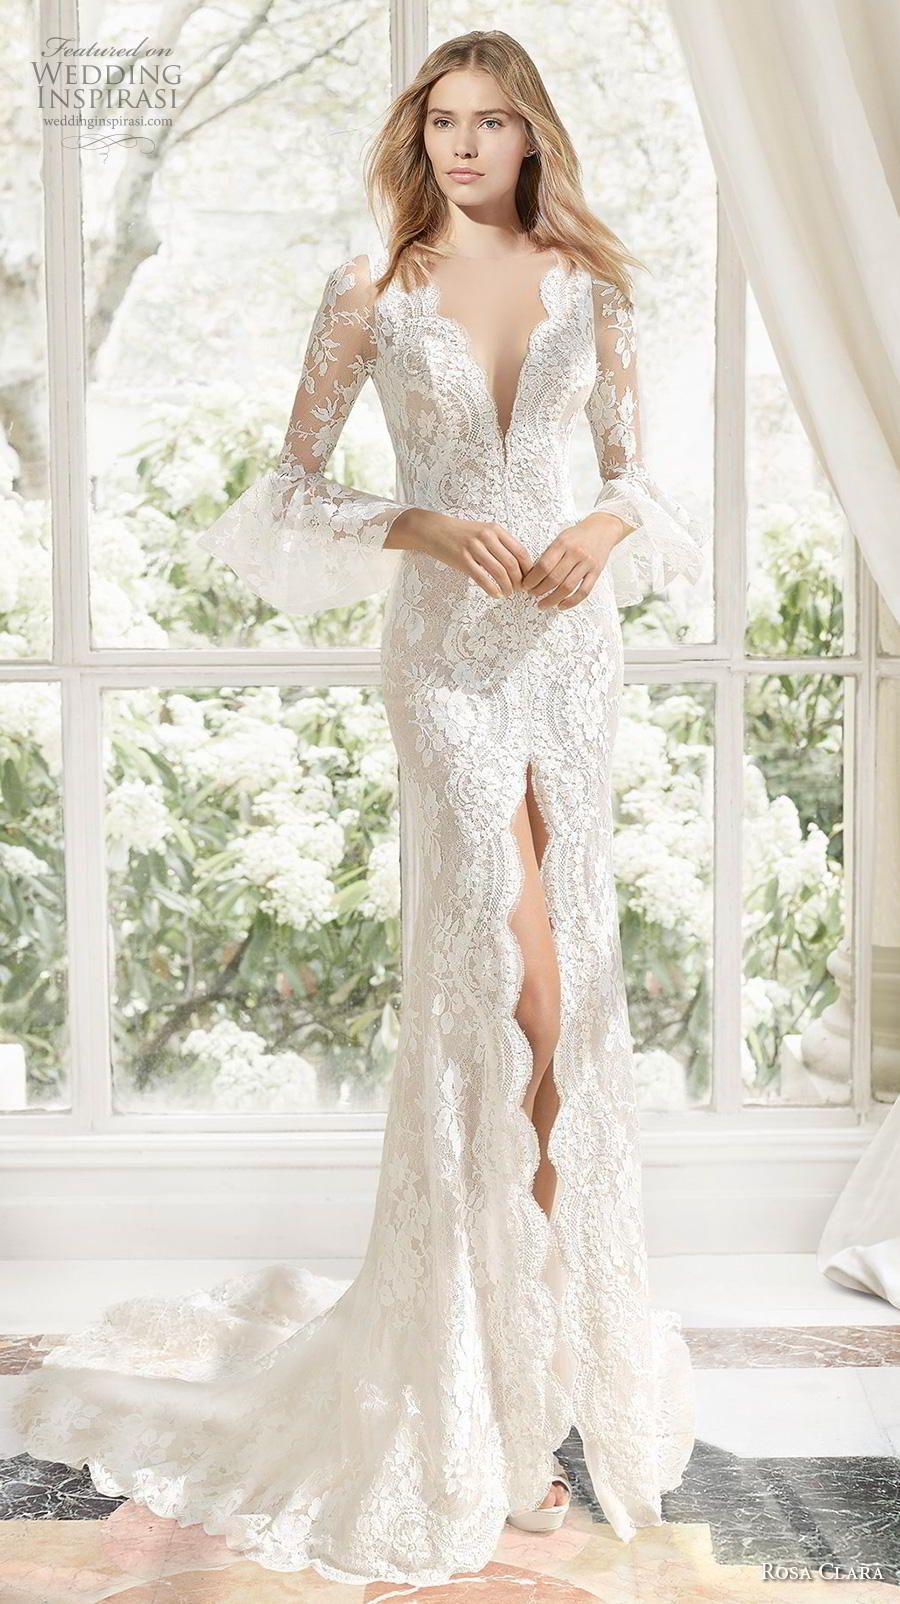 Rosa Clara Couture 2019 Wedding Dresses Wedding Inspirasi Trendy Wedding Dresses Sheer Wedding Dress Lace Mermaid Wedding Dress